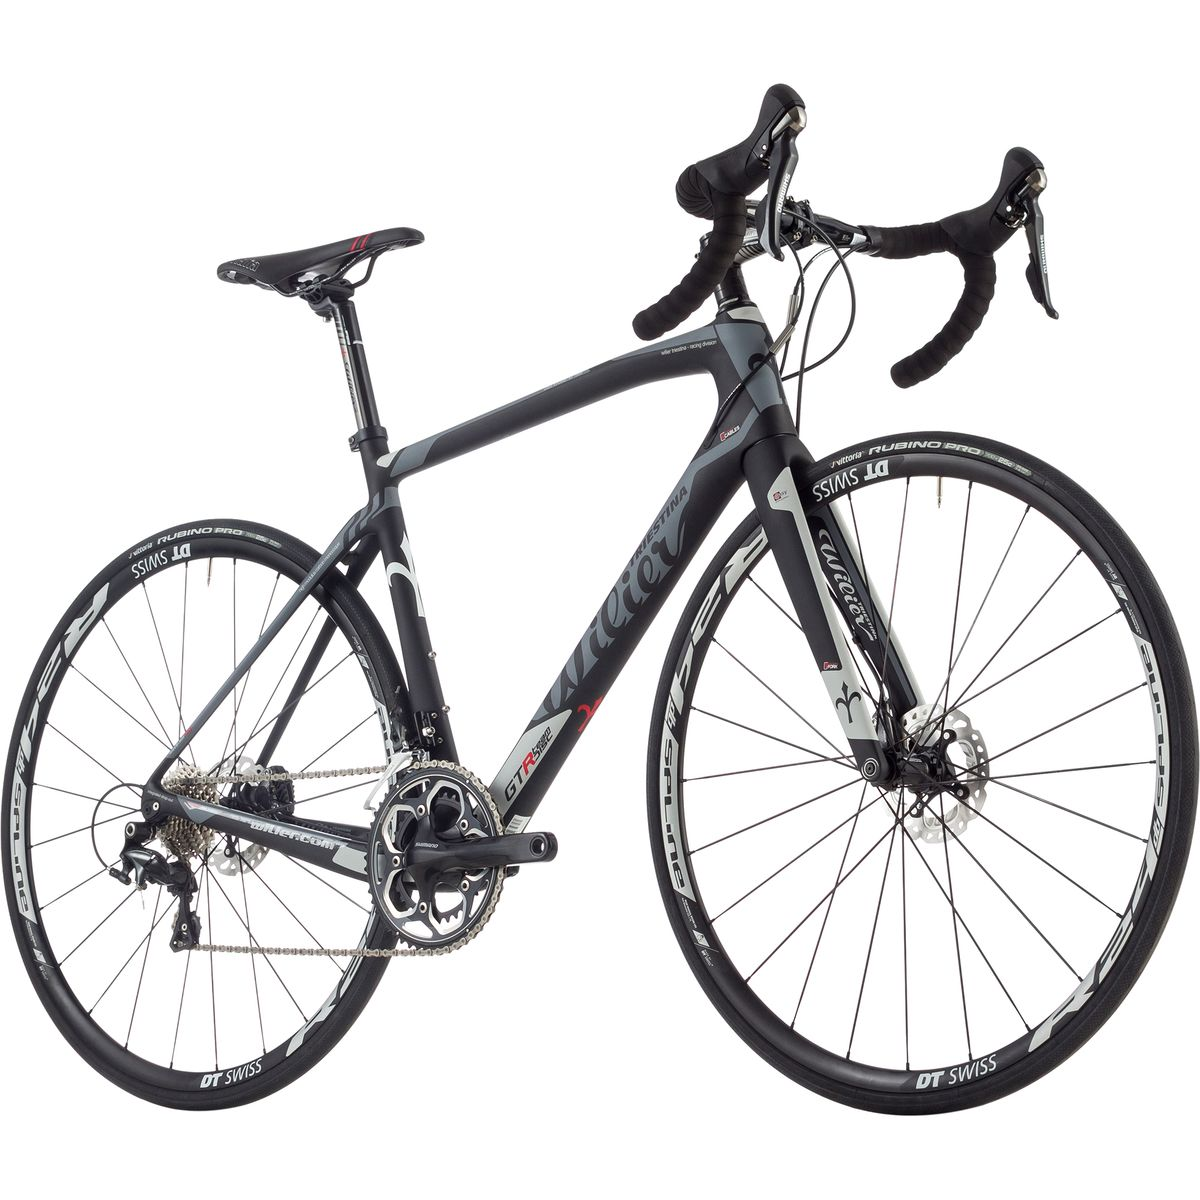 wilier gtr team disc ultegra complete road bike 2016 competitive cyclist. Black Bedroom Furniture Sets. Home Design Ideas